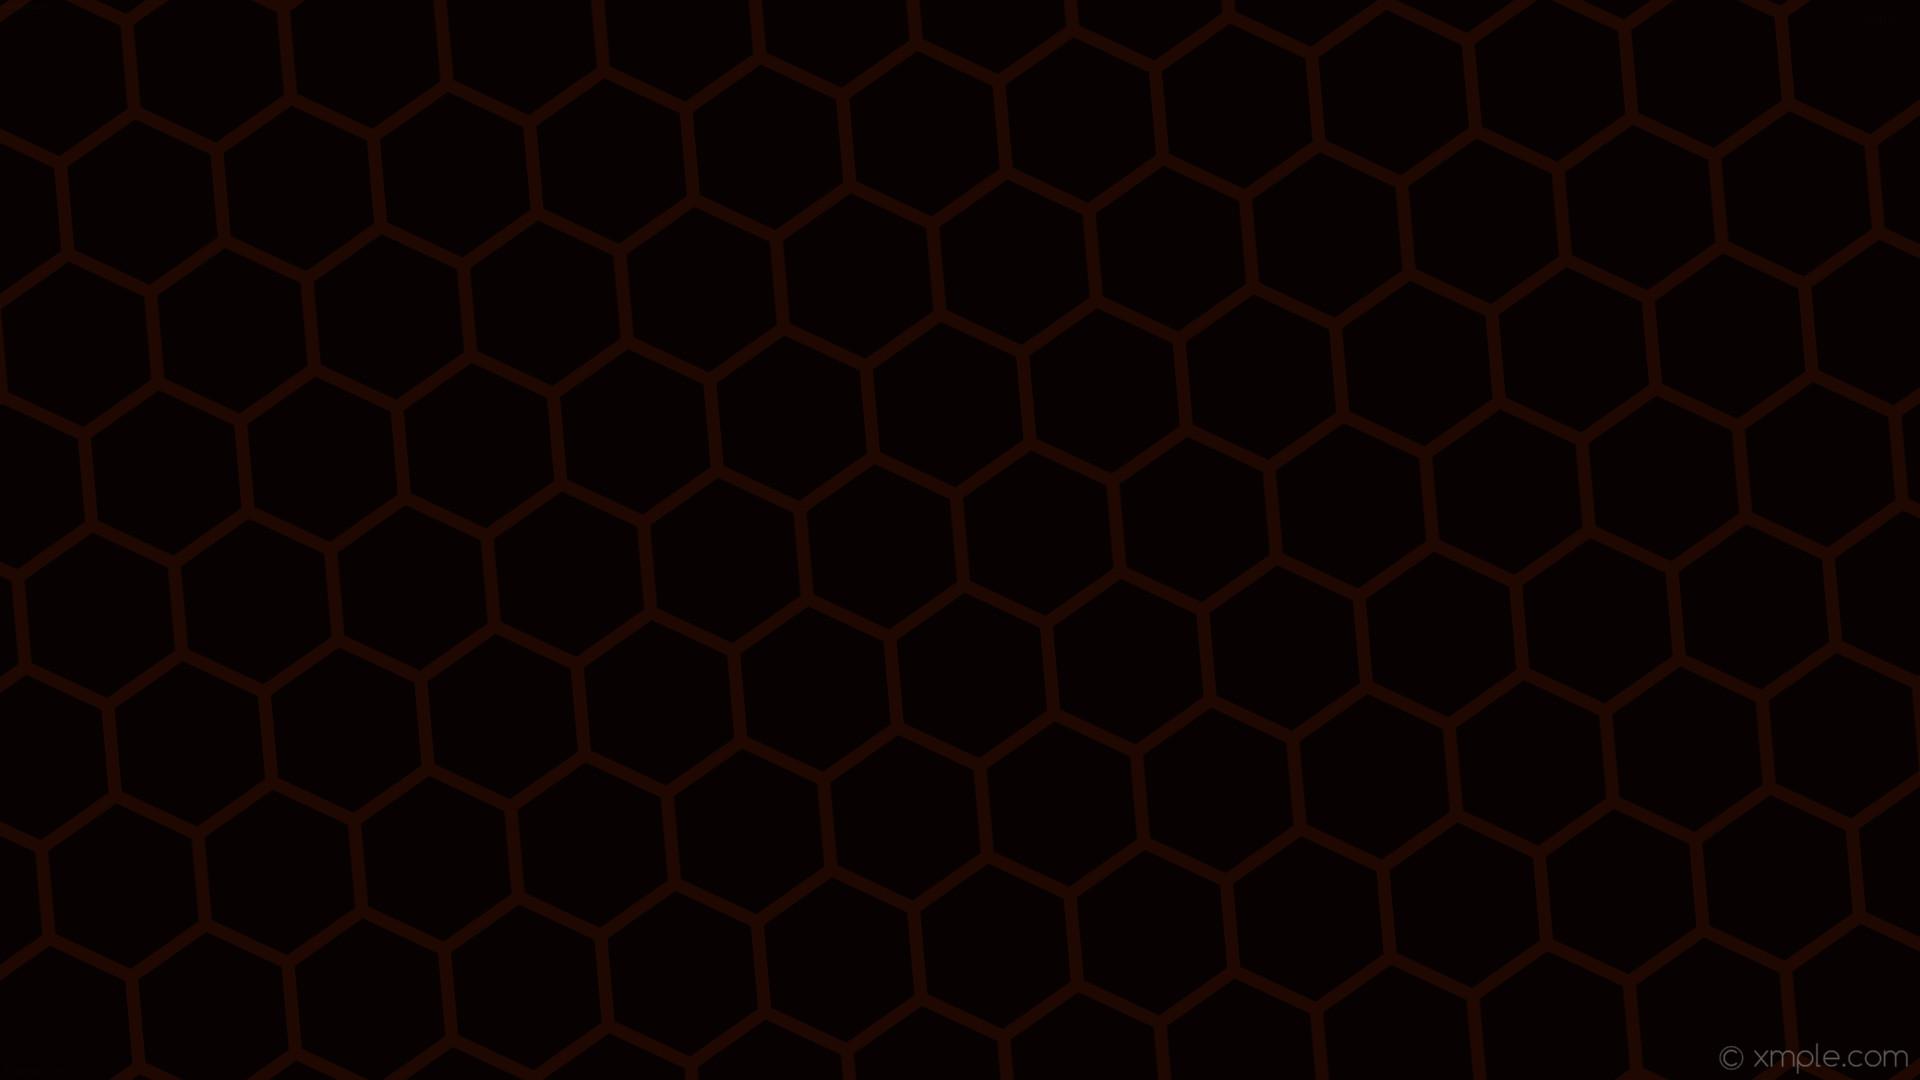 wallpaper beehive hexagon red black honeycomb dark red #070201 #1f0802  diagonal 5° 13px